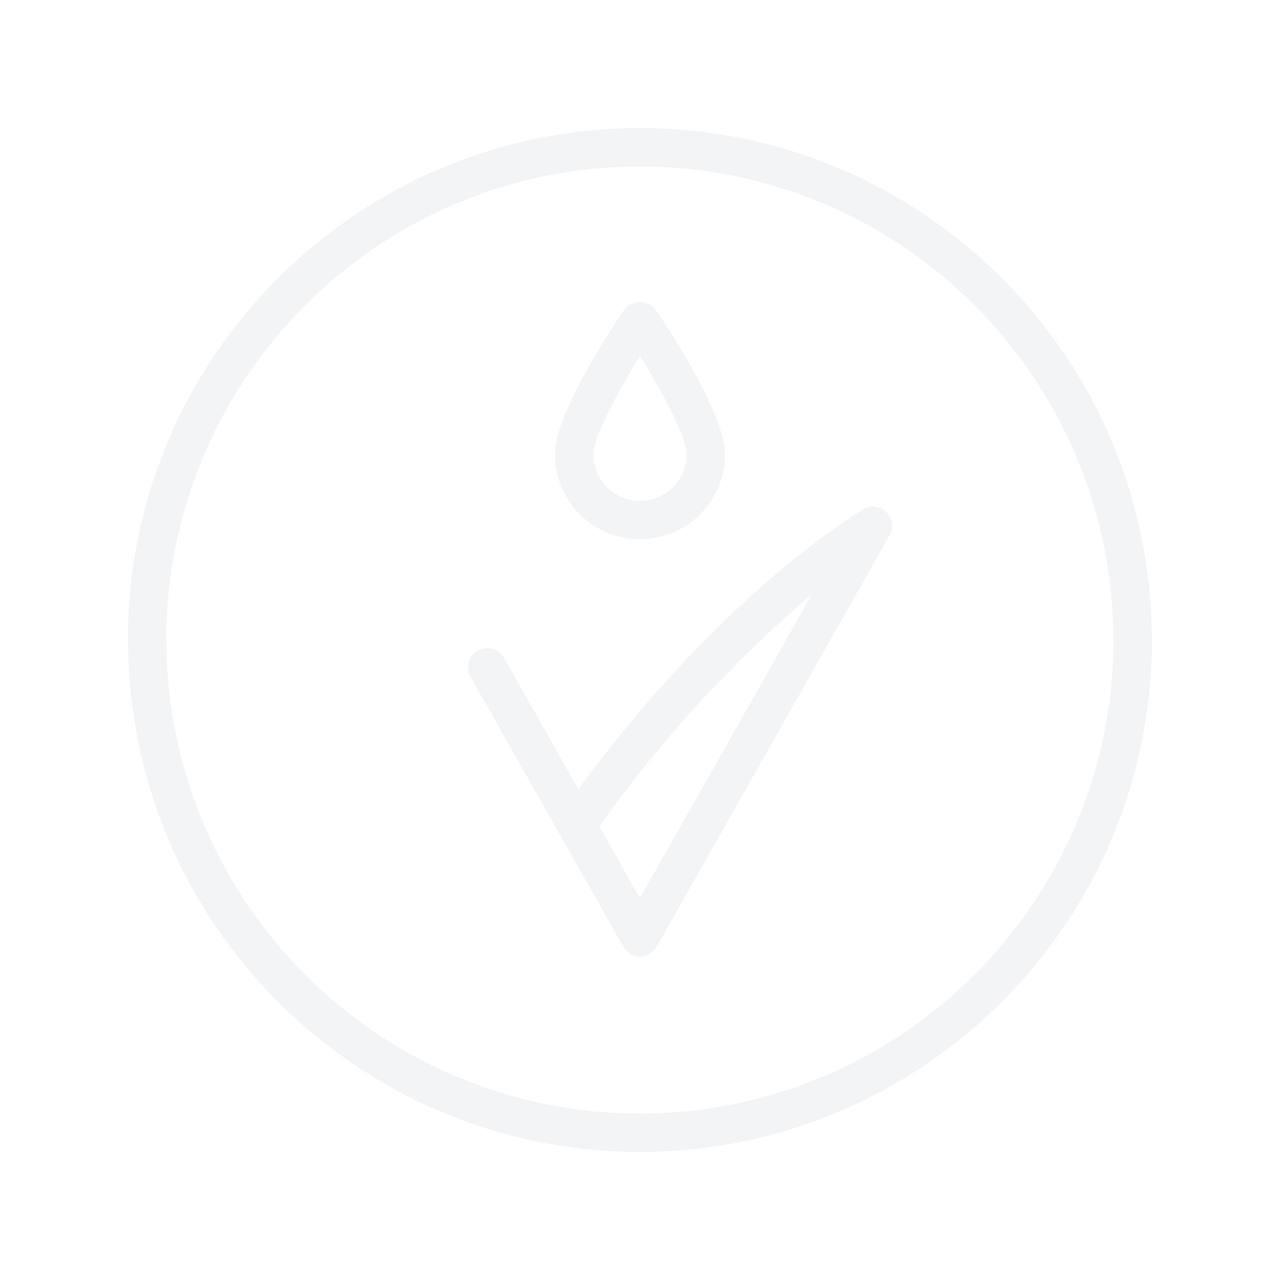 L'Oreal True Match Powder 9g